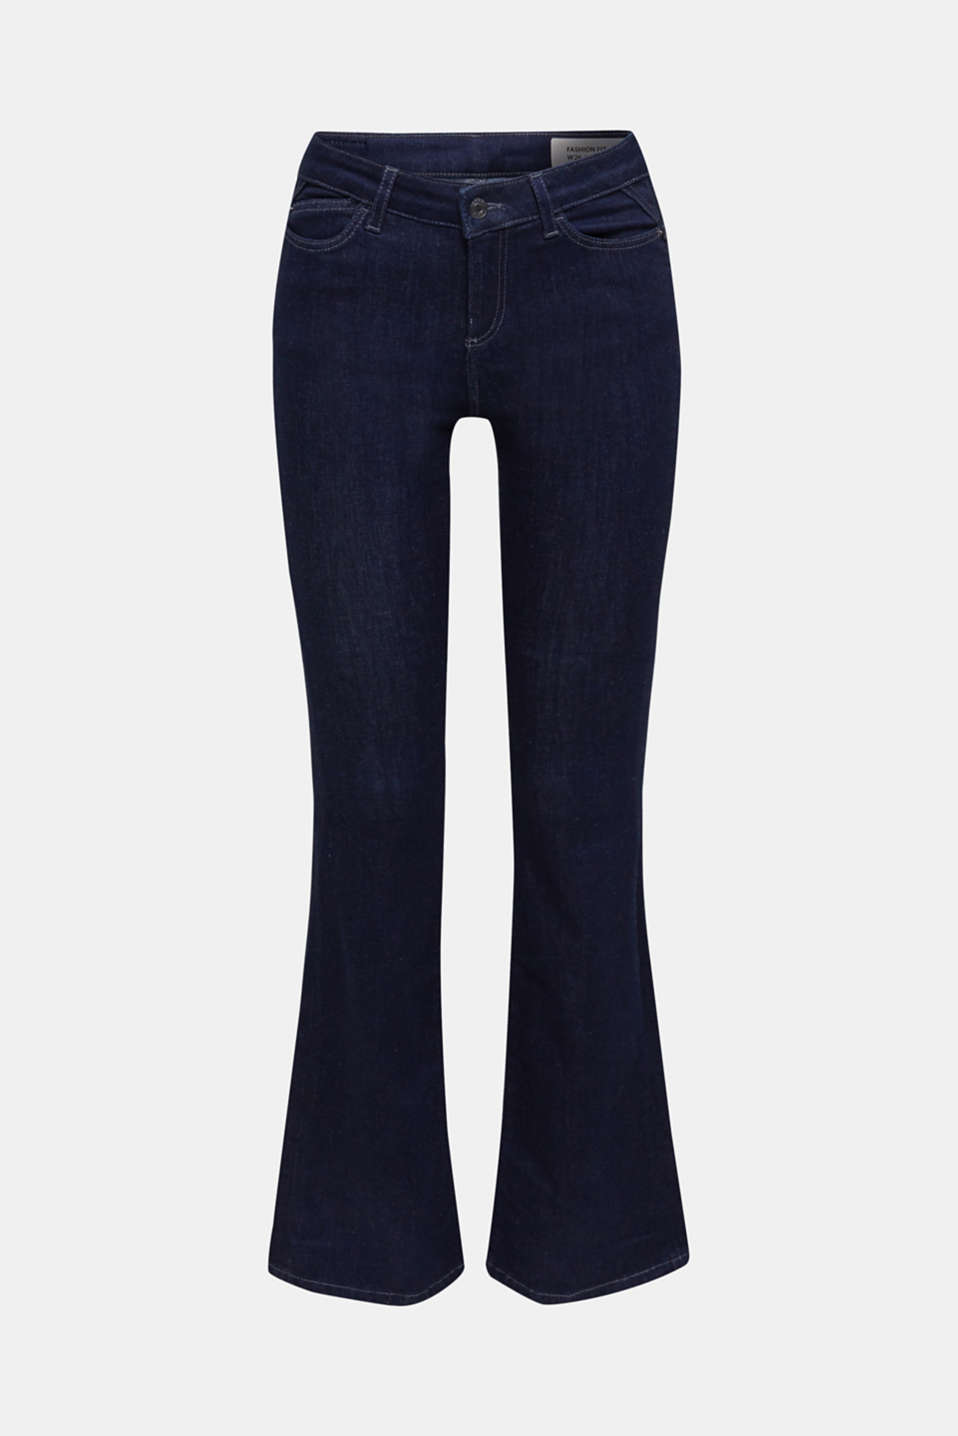 Shaping jeans in dark denim, BLUE RINSE, detail image number 6